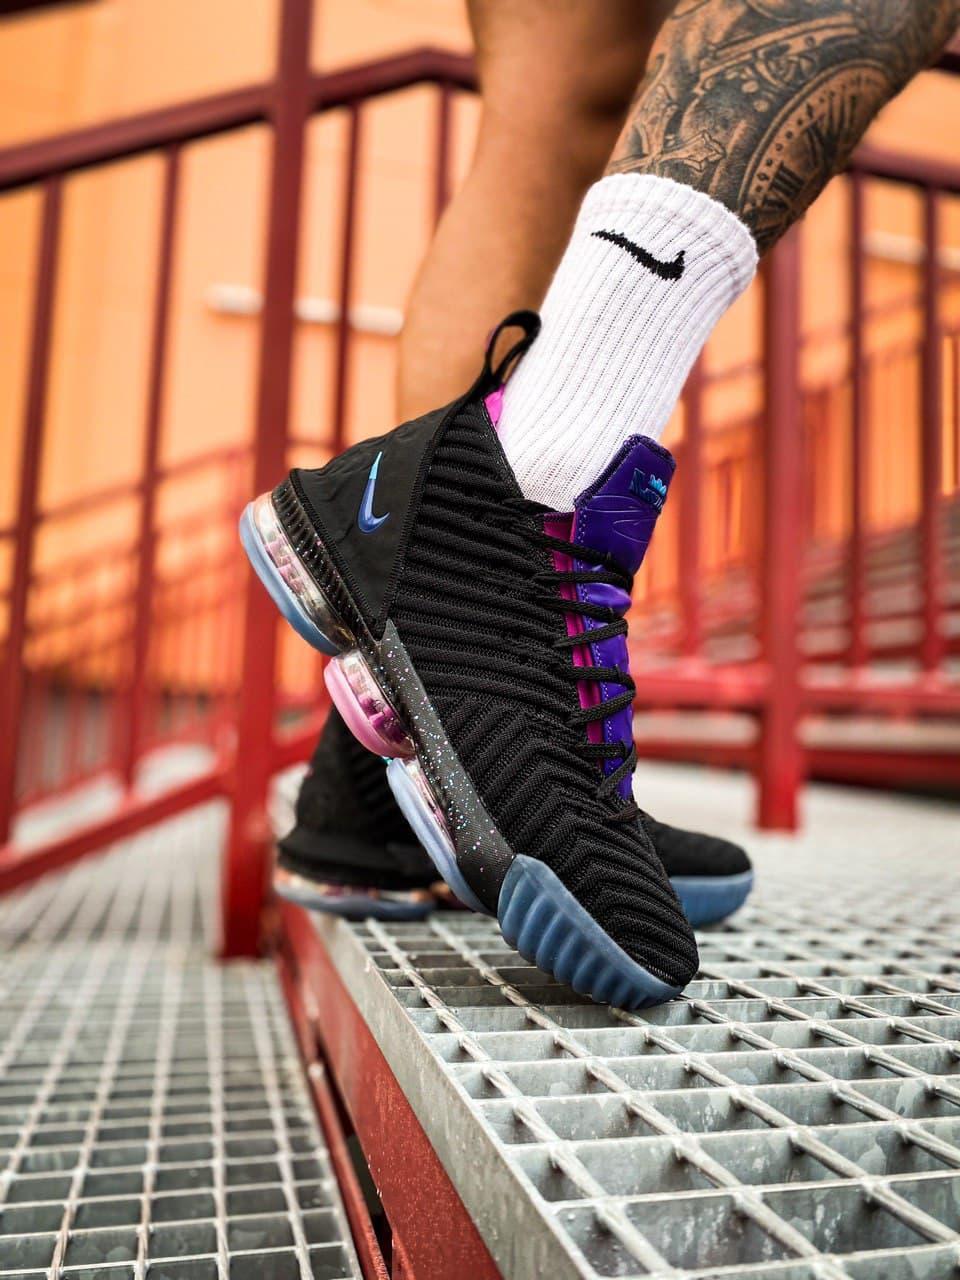 Кроссовки мужские Nike LeBron 16 White Graffiti Black